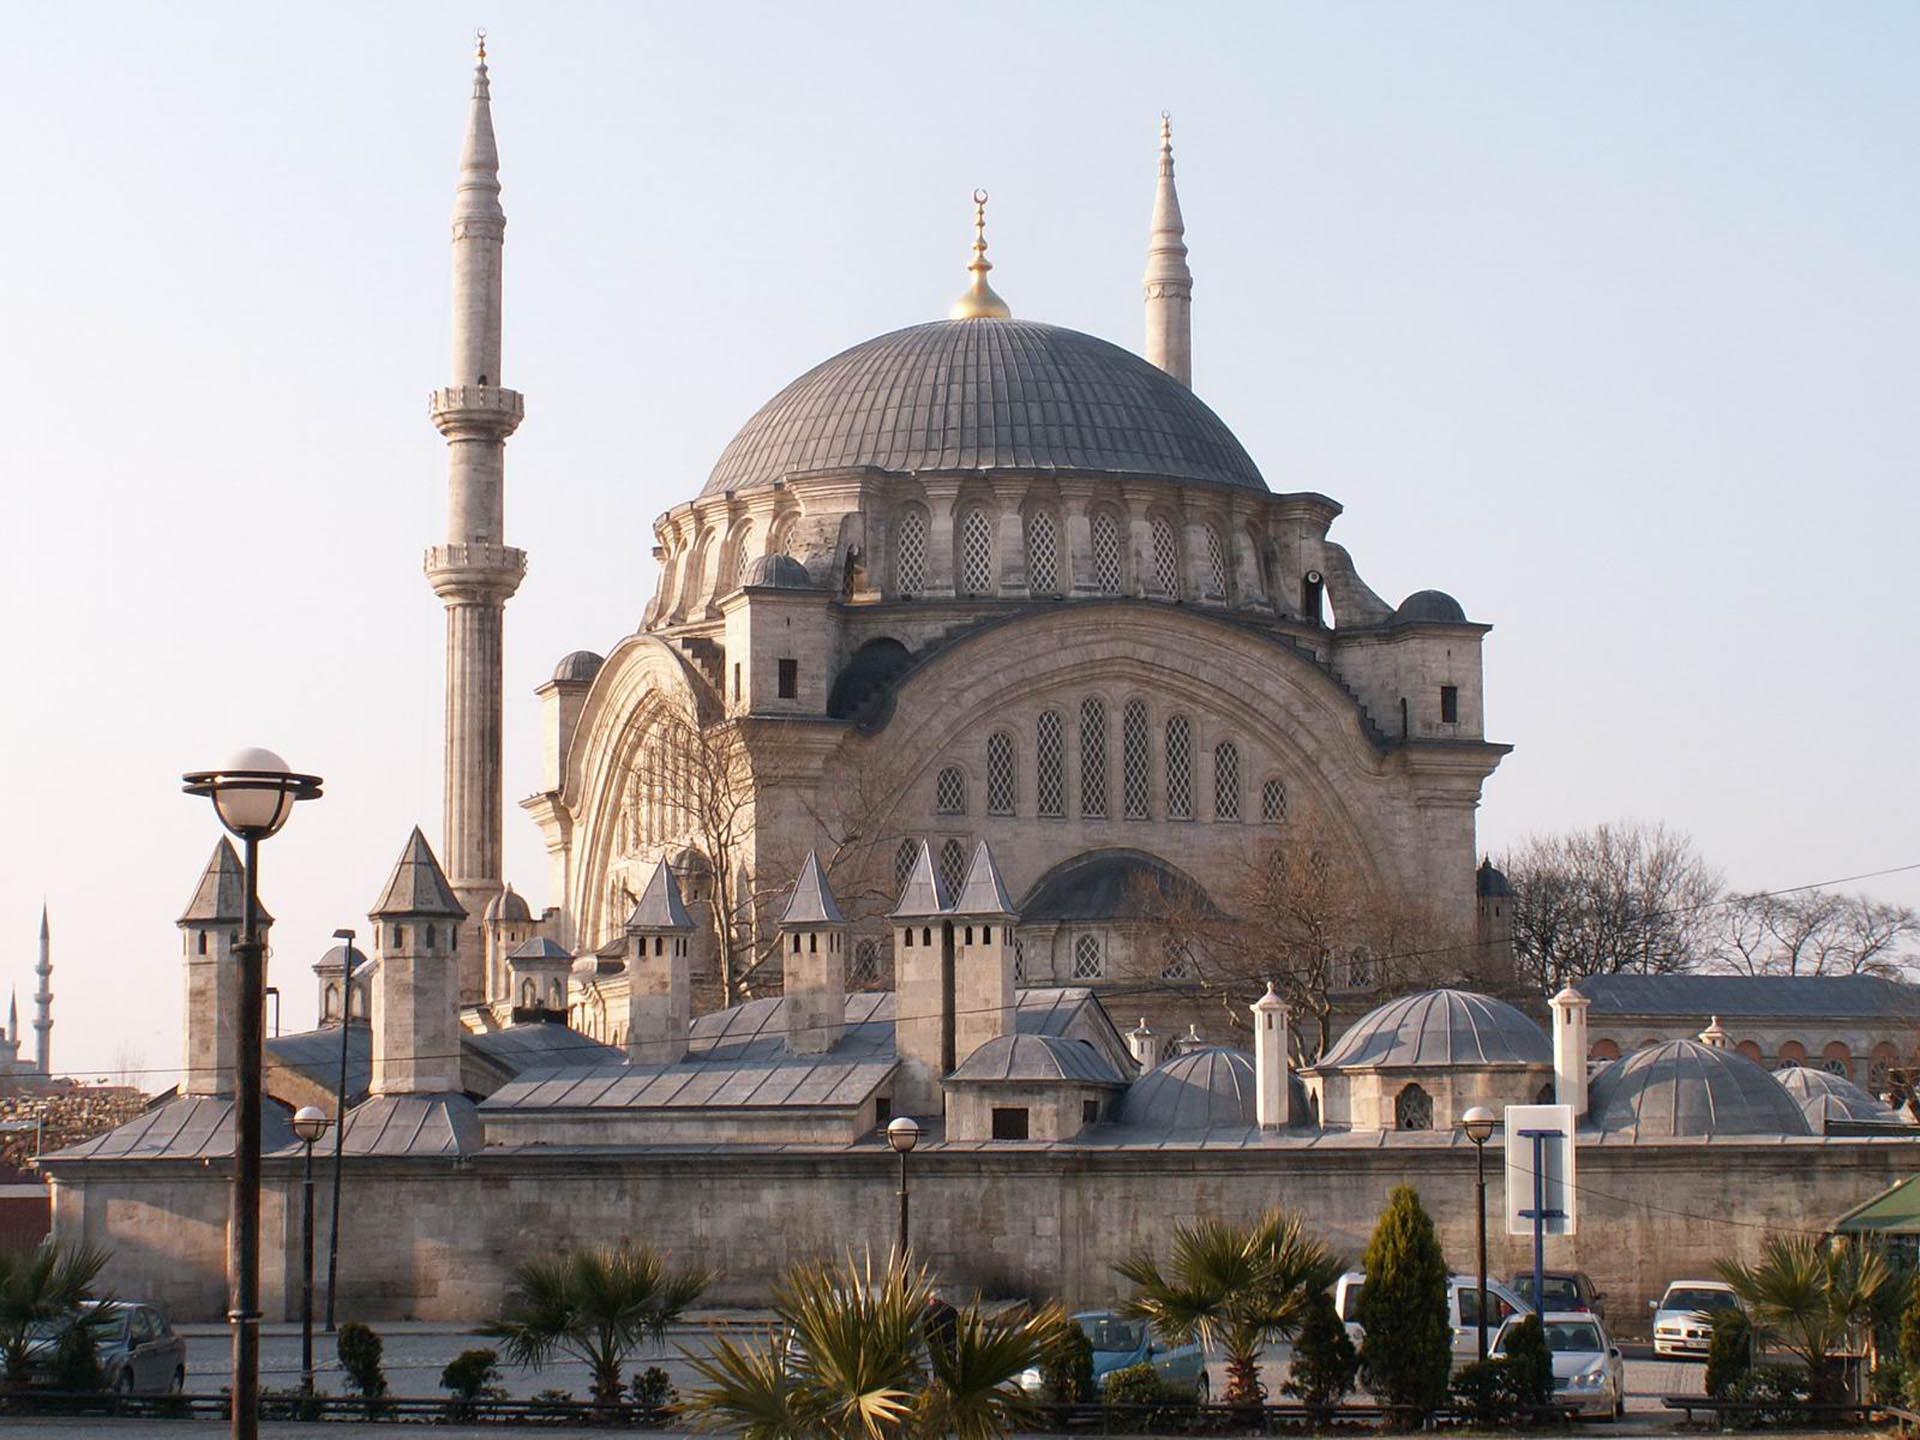 Nuruosmaniye Mosque Eresin hotels sultanahmet